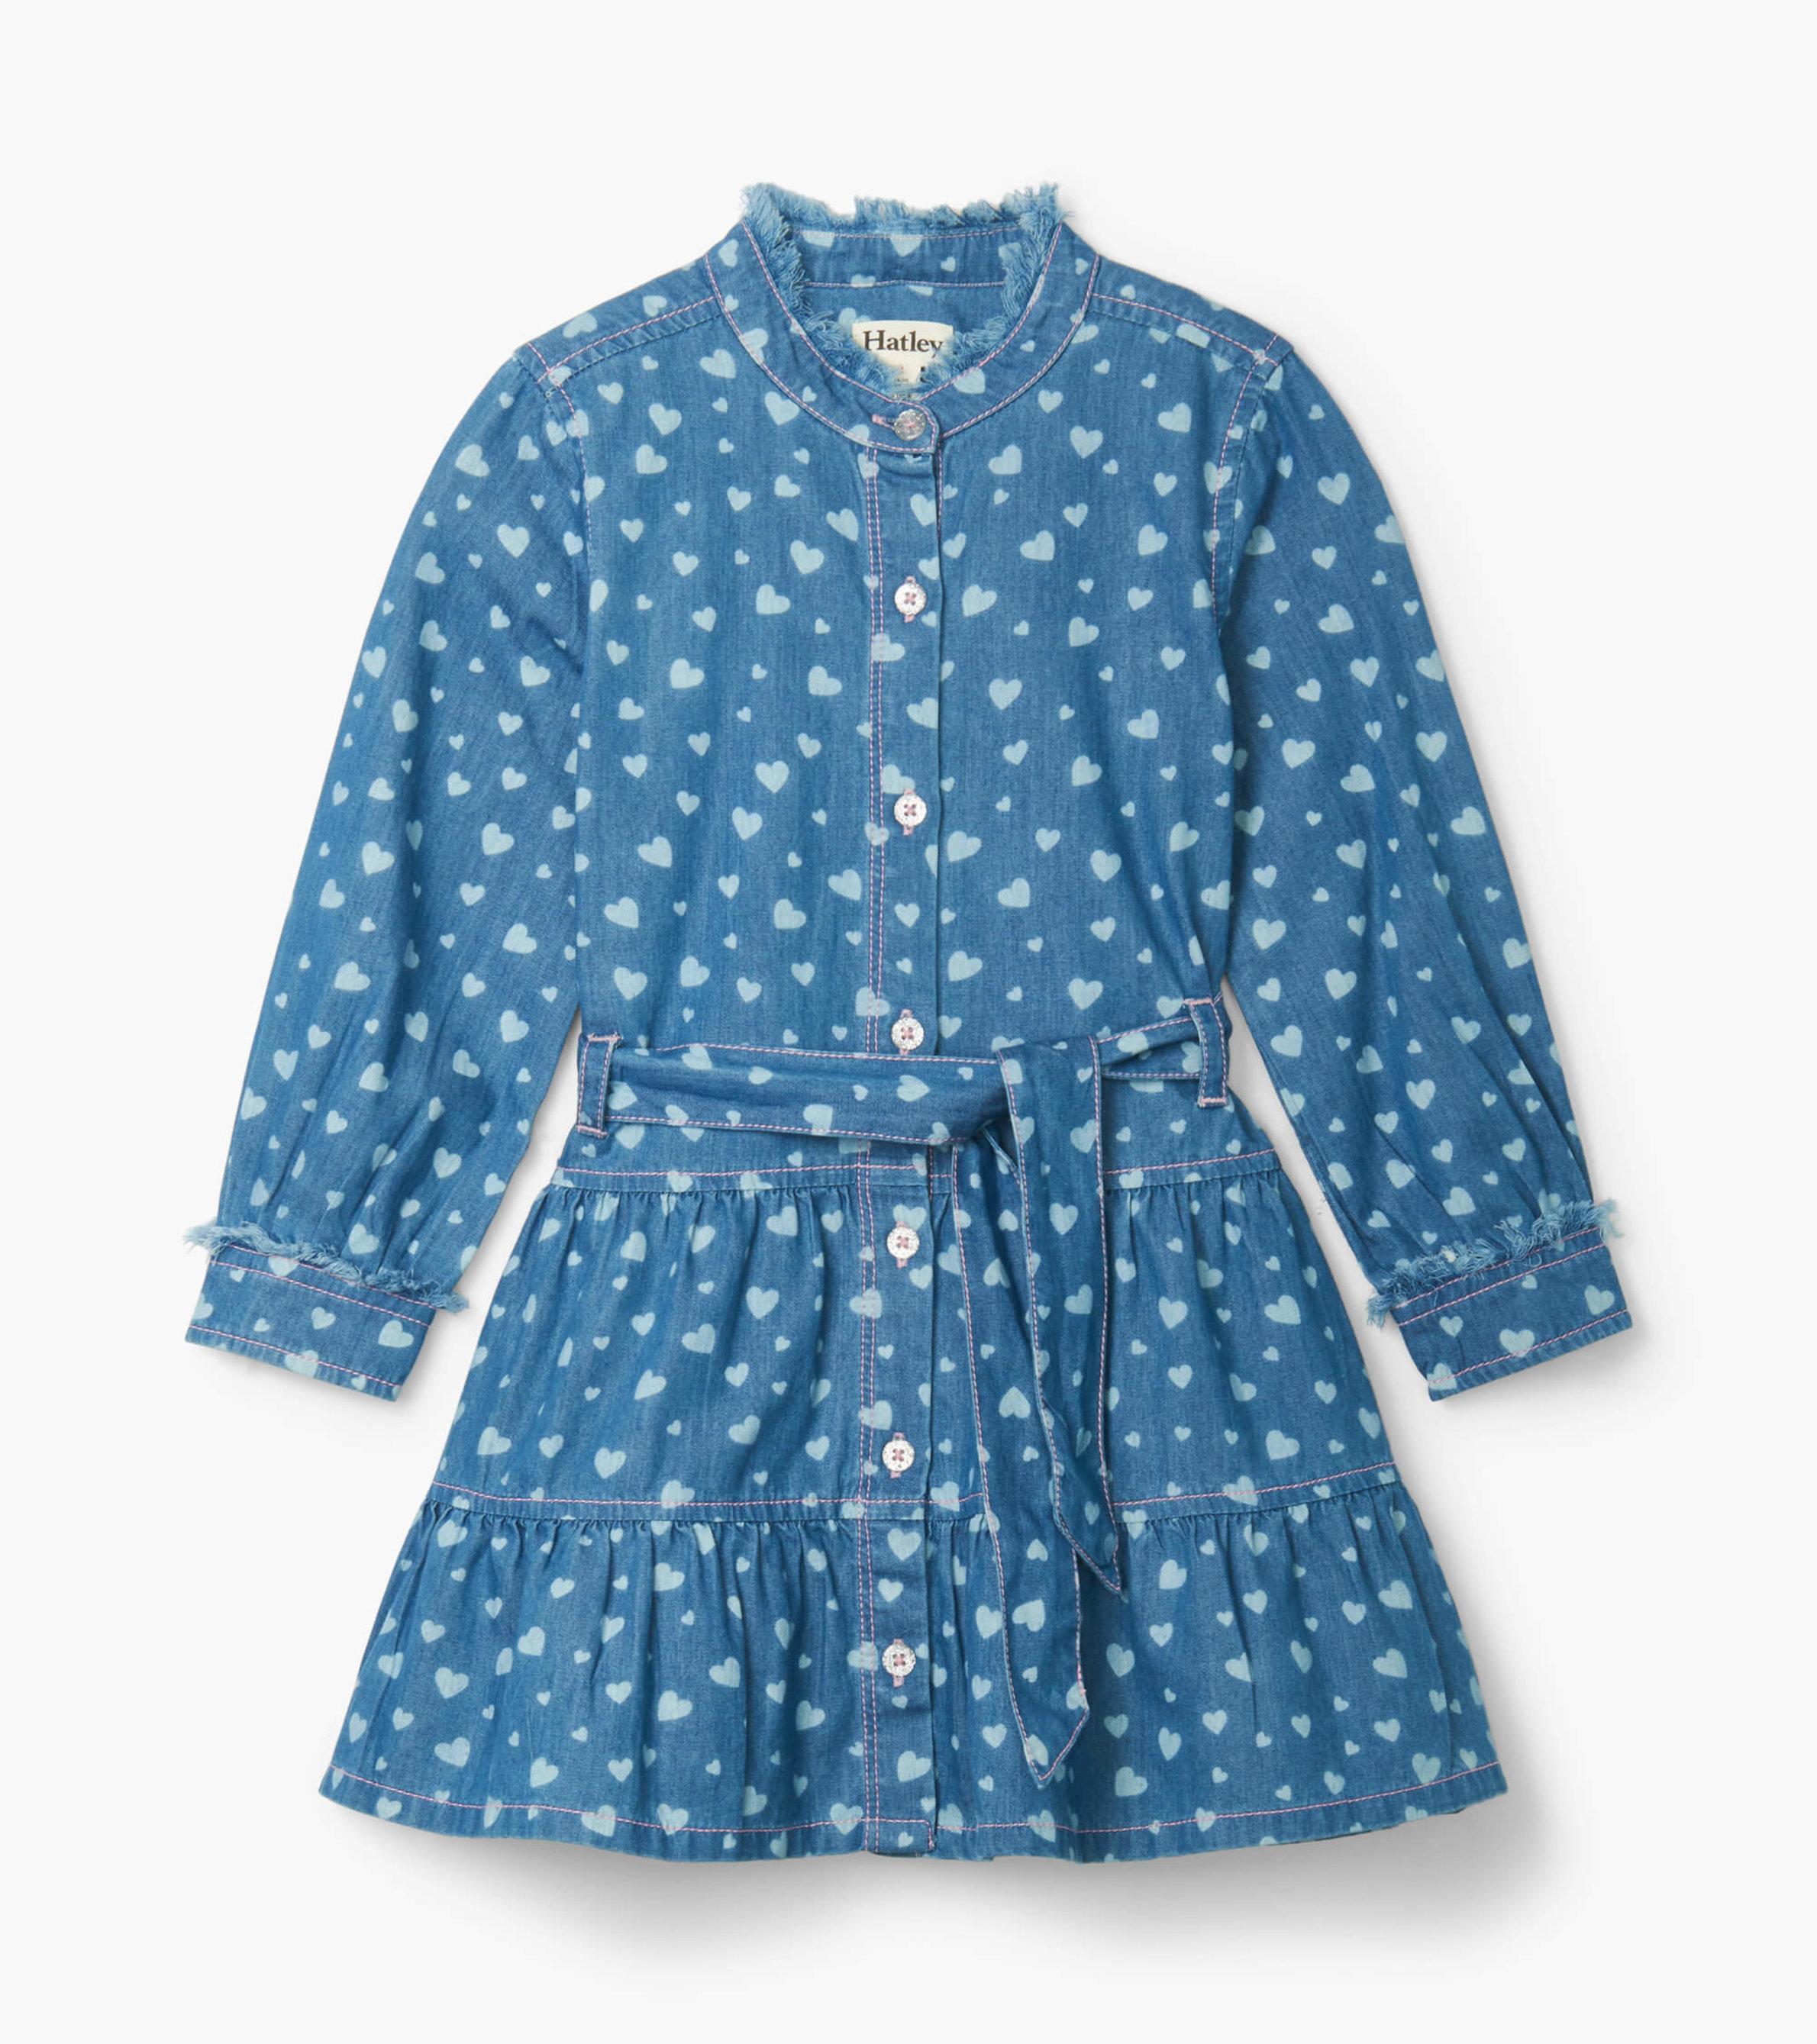 SALE £32.80 Hatley Heart Cluster Button Down Denim Dress (was £41.00)